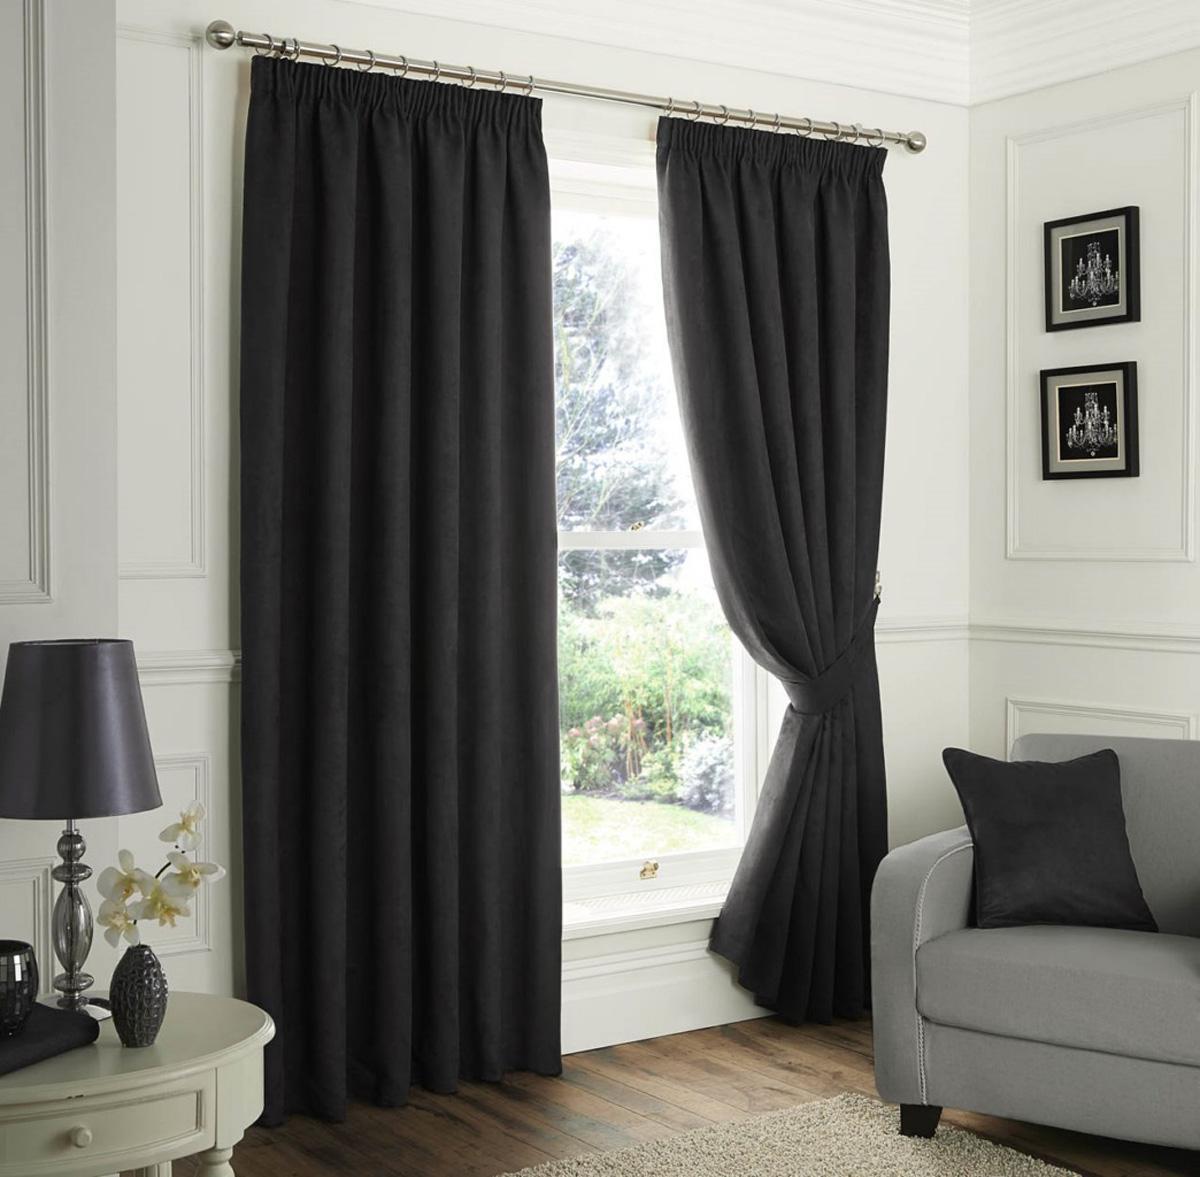 Black curtain lining fabric